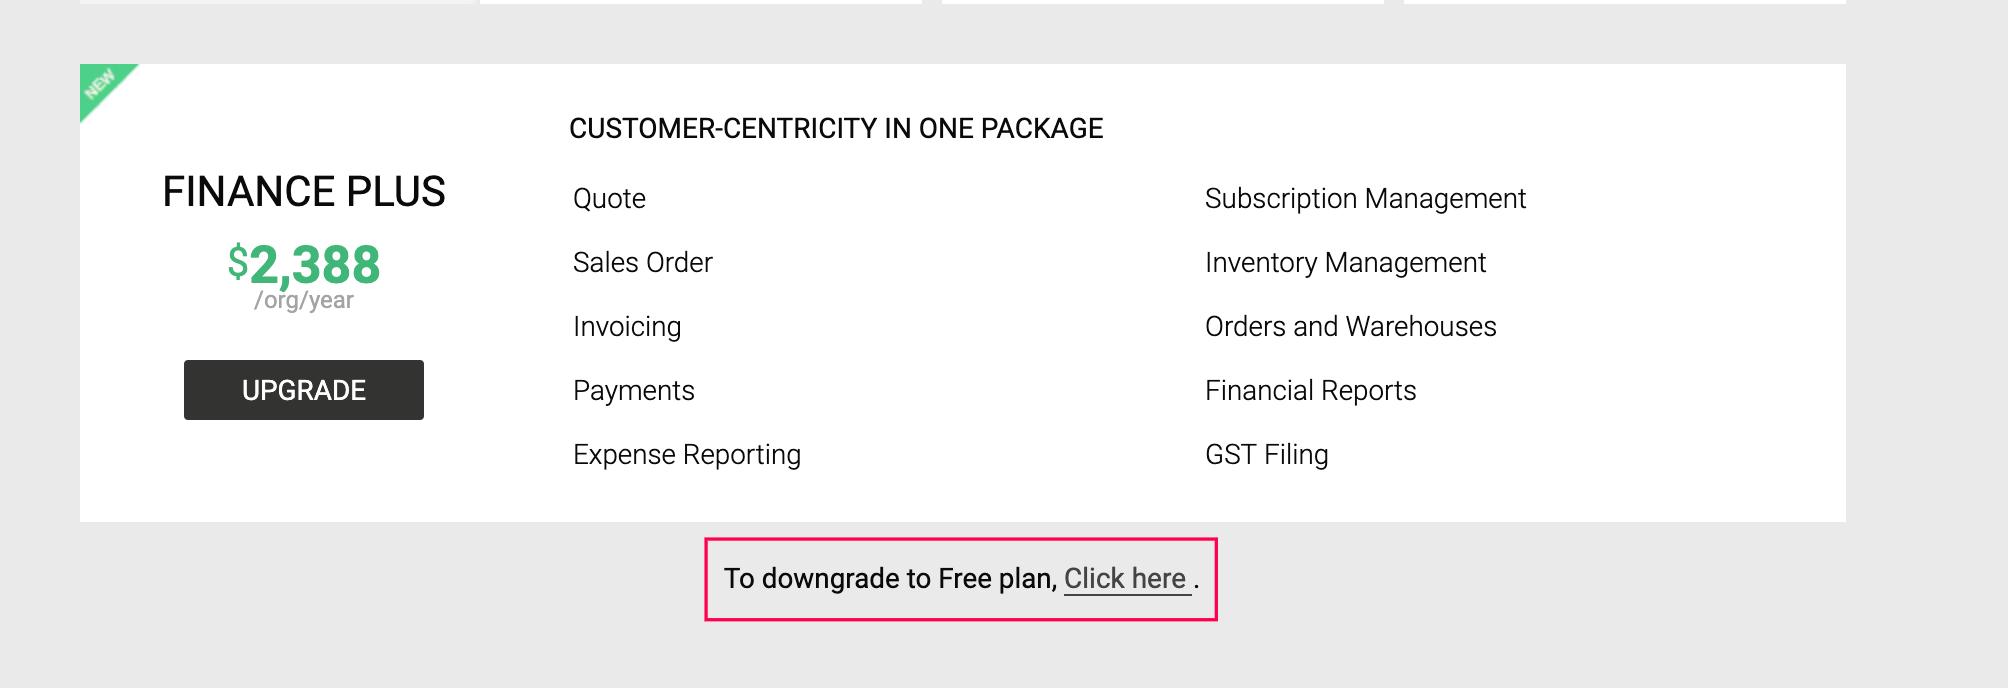 Dowgrade to free plan